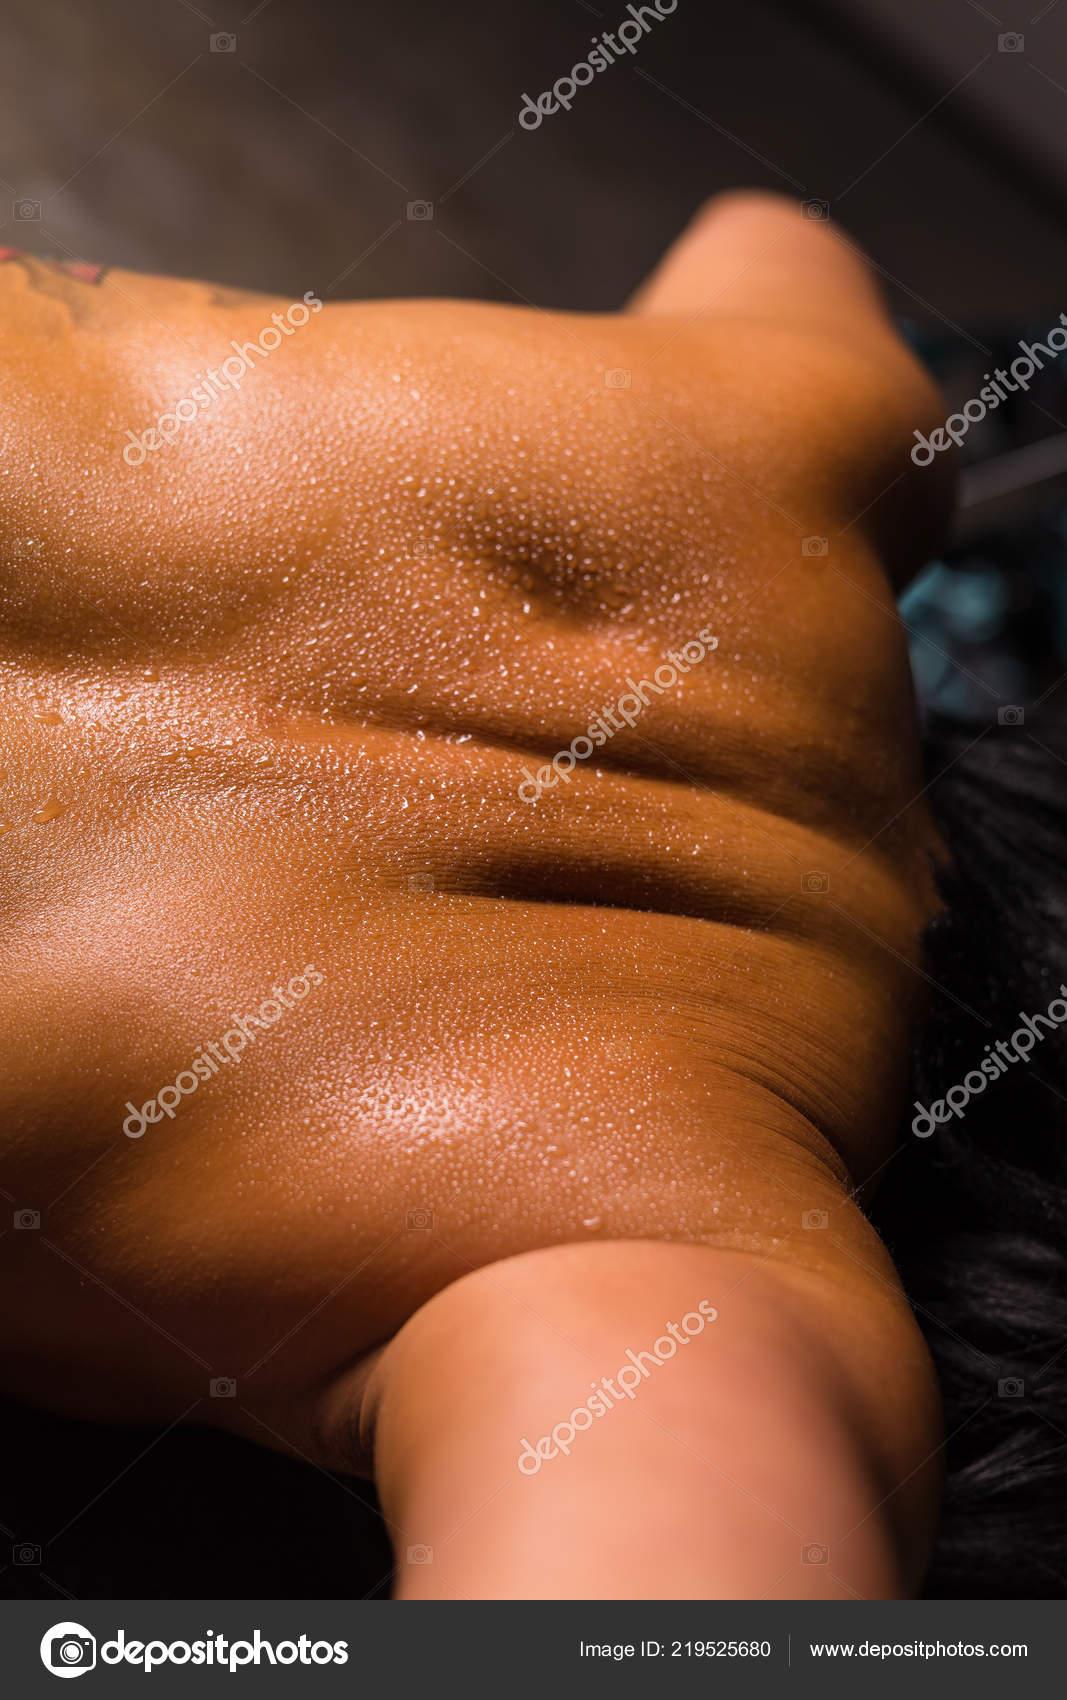 Young nudist close ups